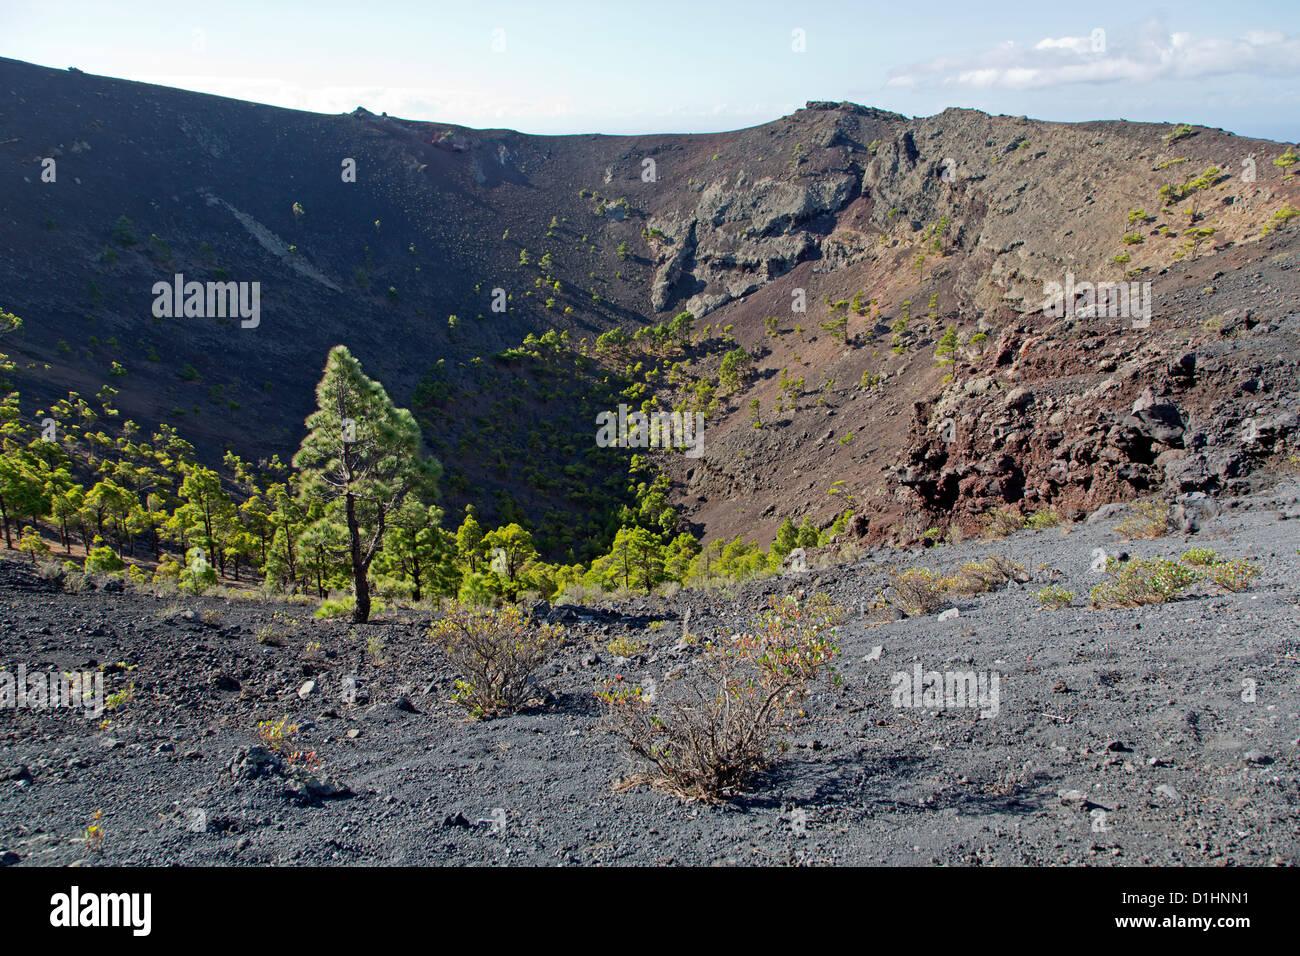 Vulkankrater San Antonio, La Palma, Spanien Stockbild